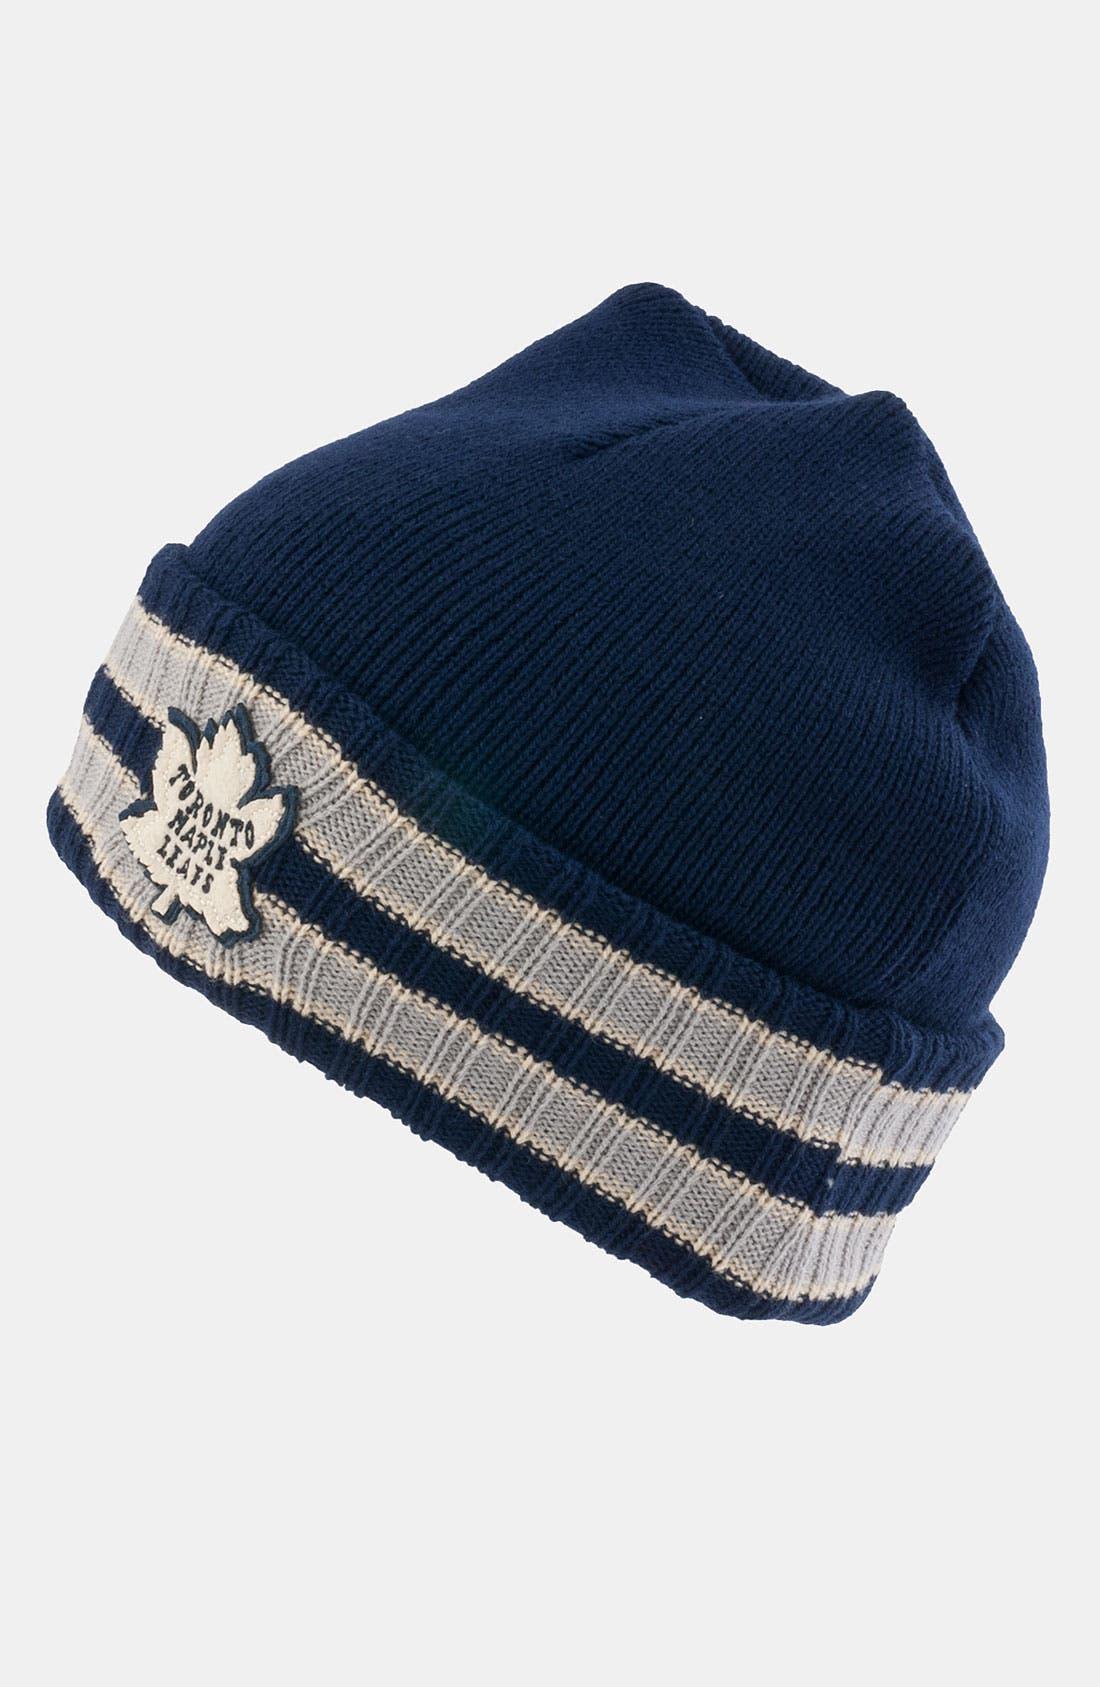 Main Image - American Needle 'Toronto Maple Leafs - Slash' Knit Hat